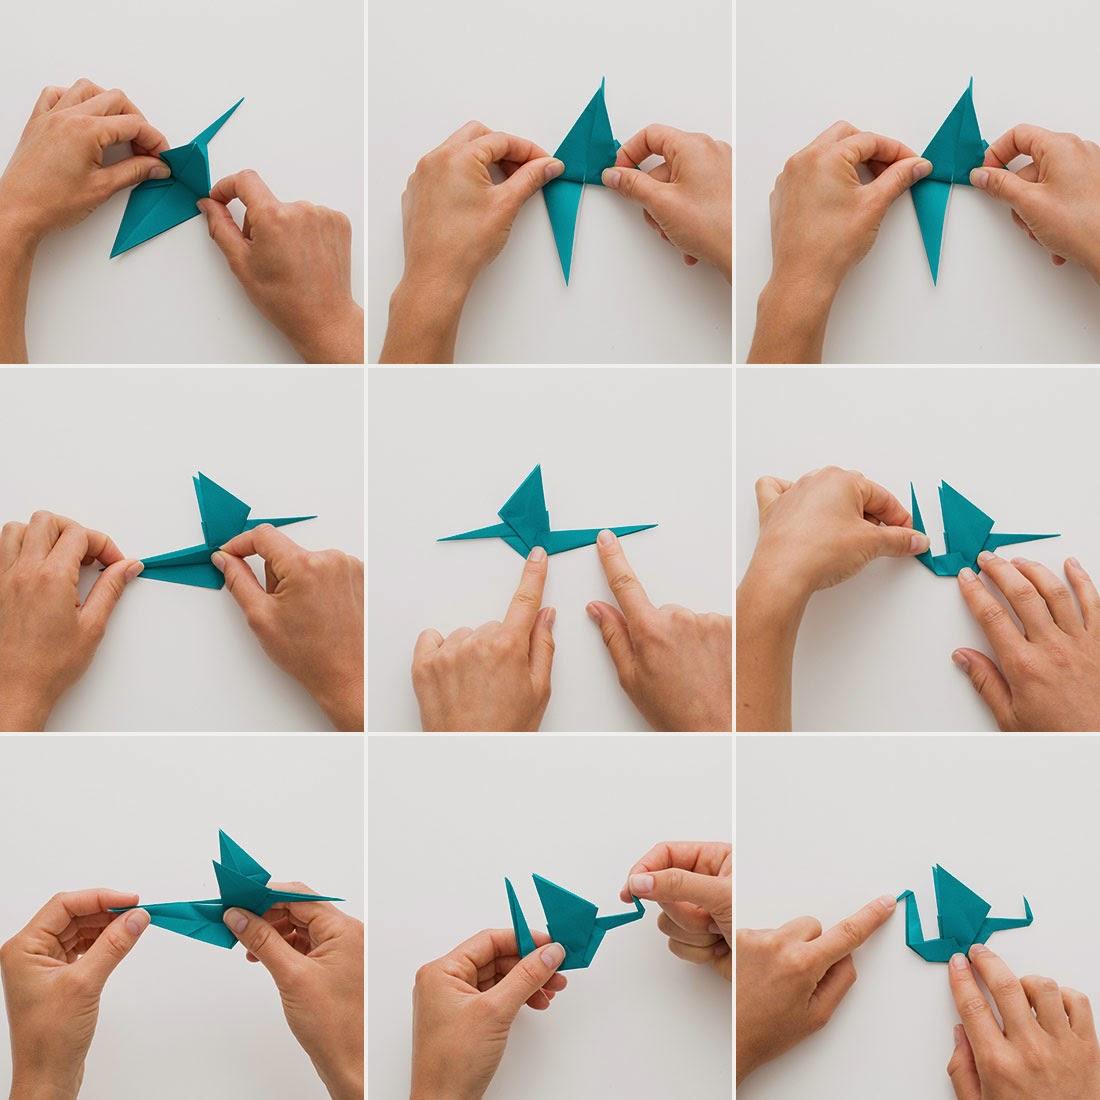 Anapakova diy paso a paso como hacer origami - Hacer armario empotrado paso paso ...